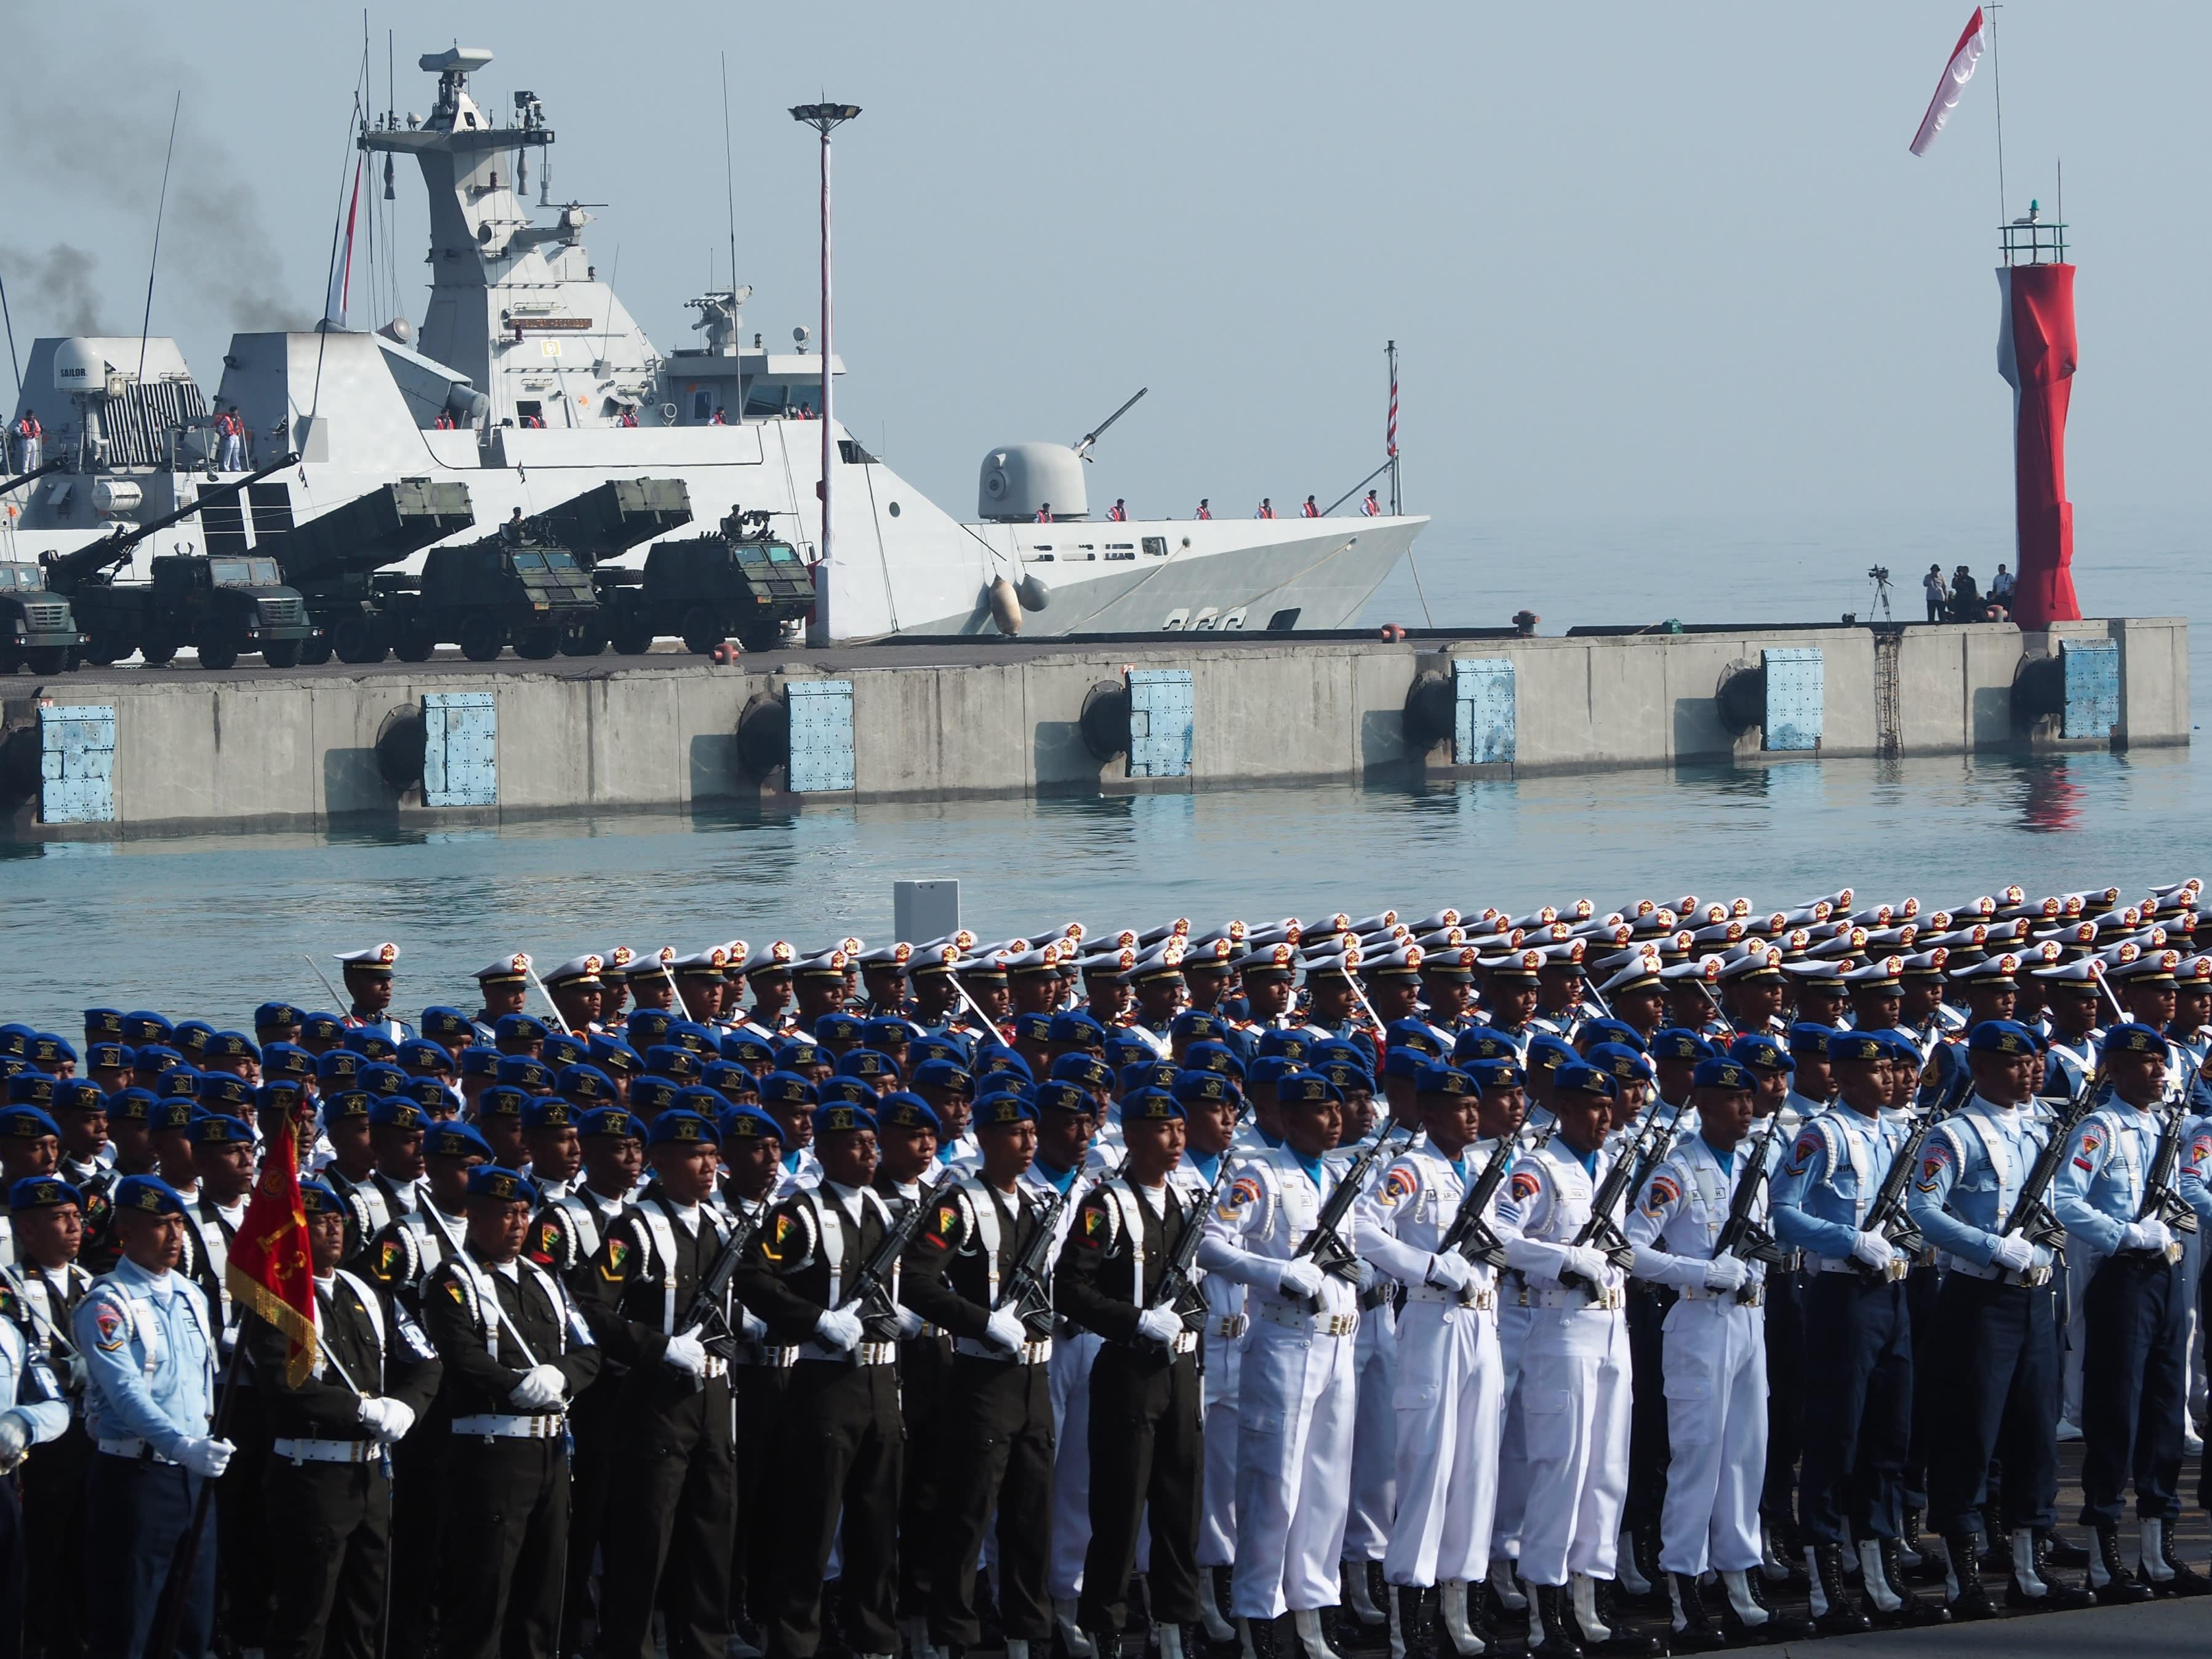 Militer Angkatan Laut Indonesia